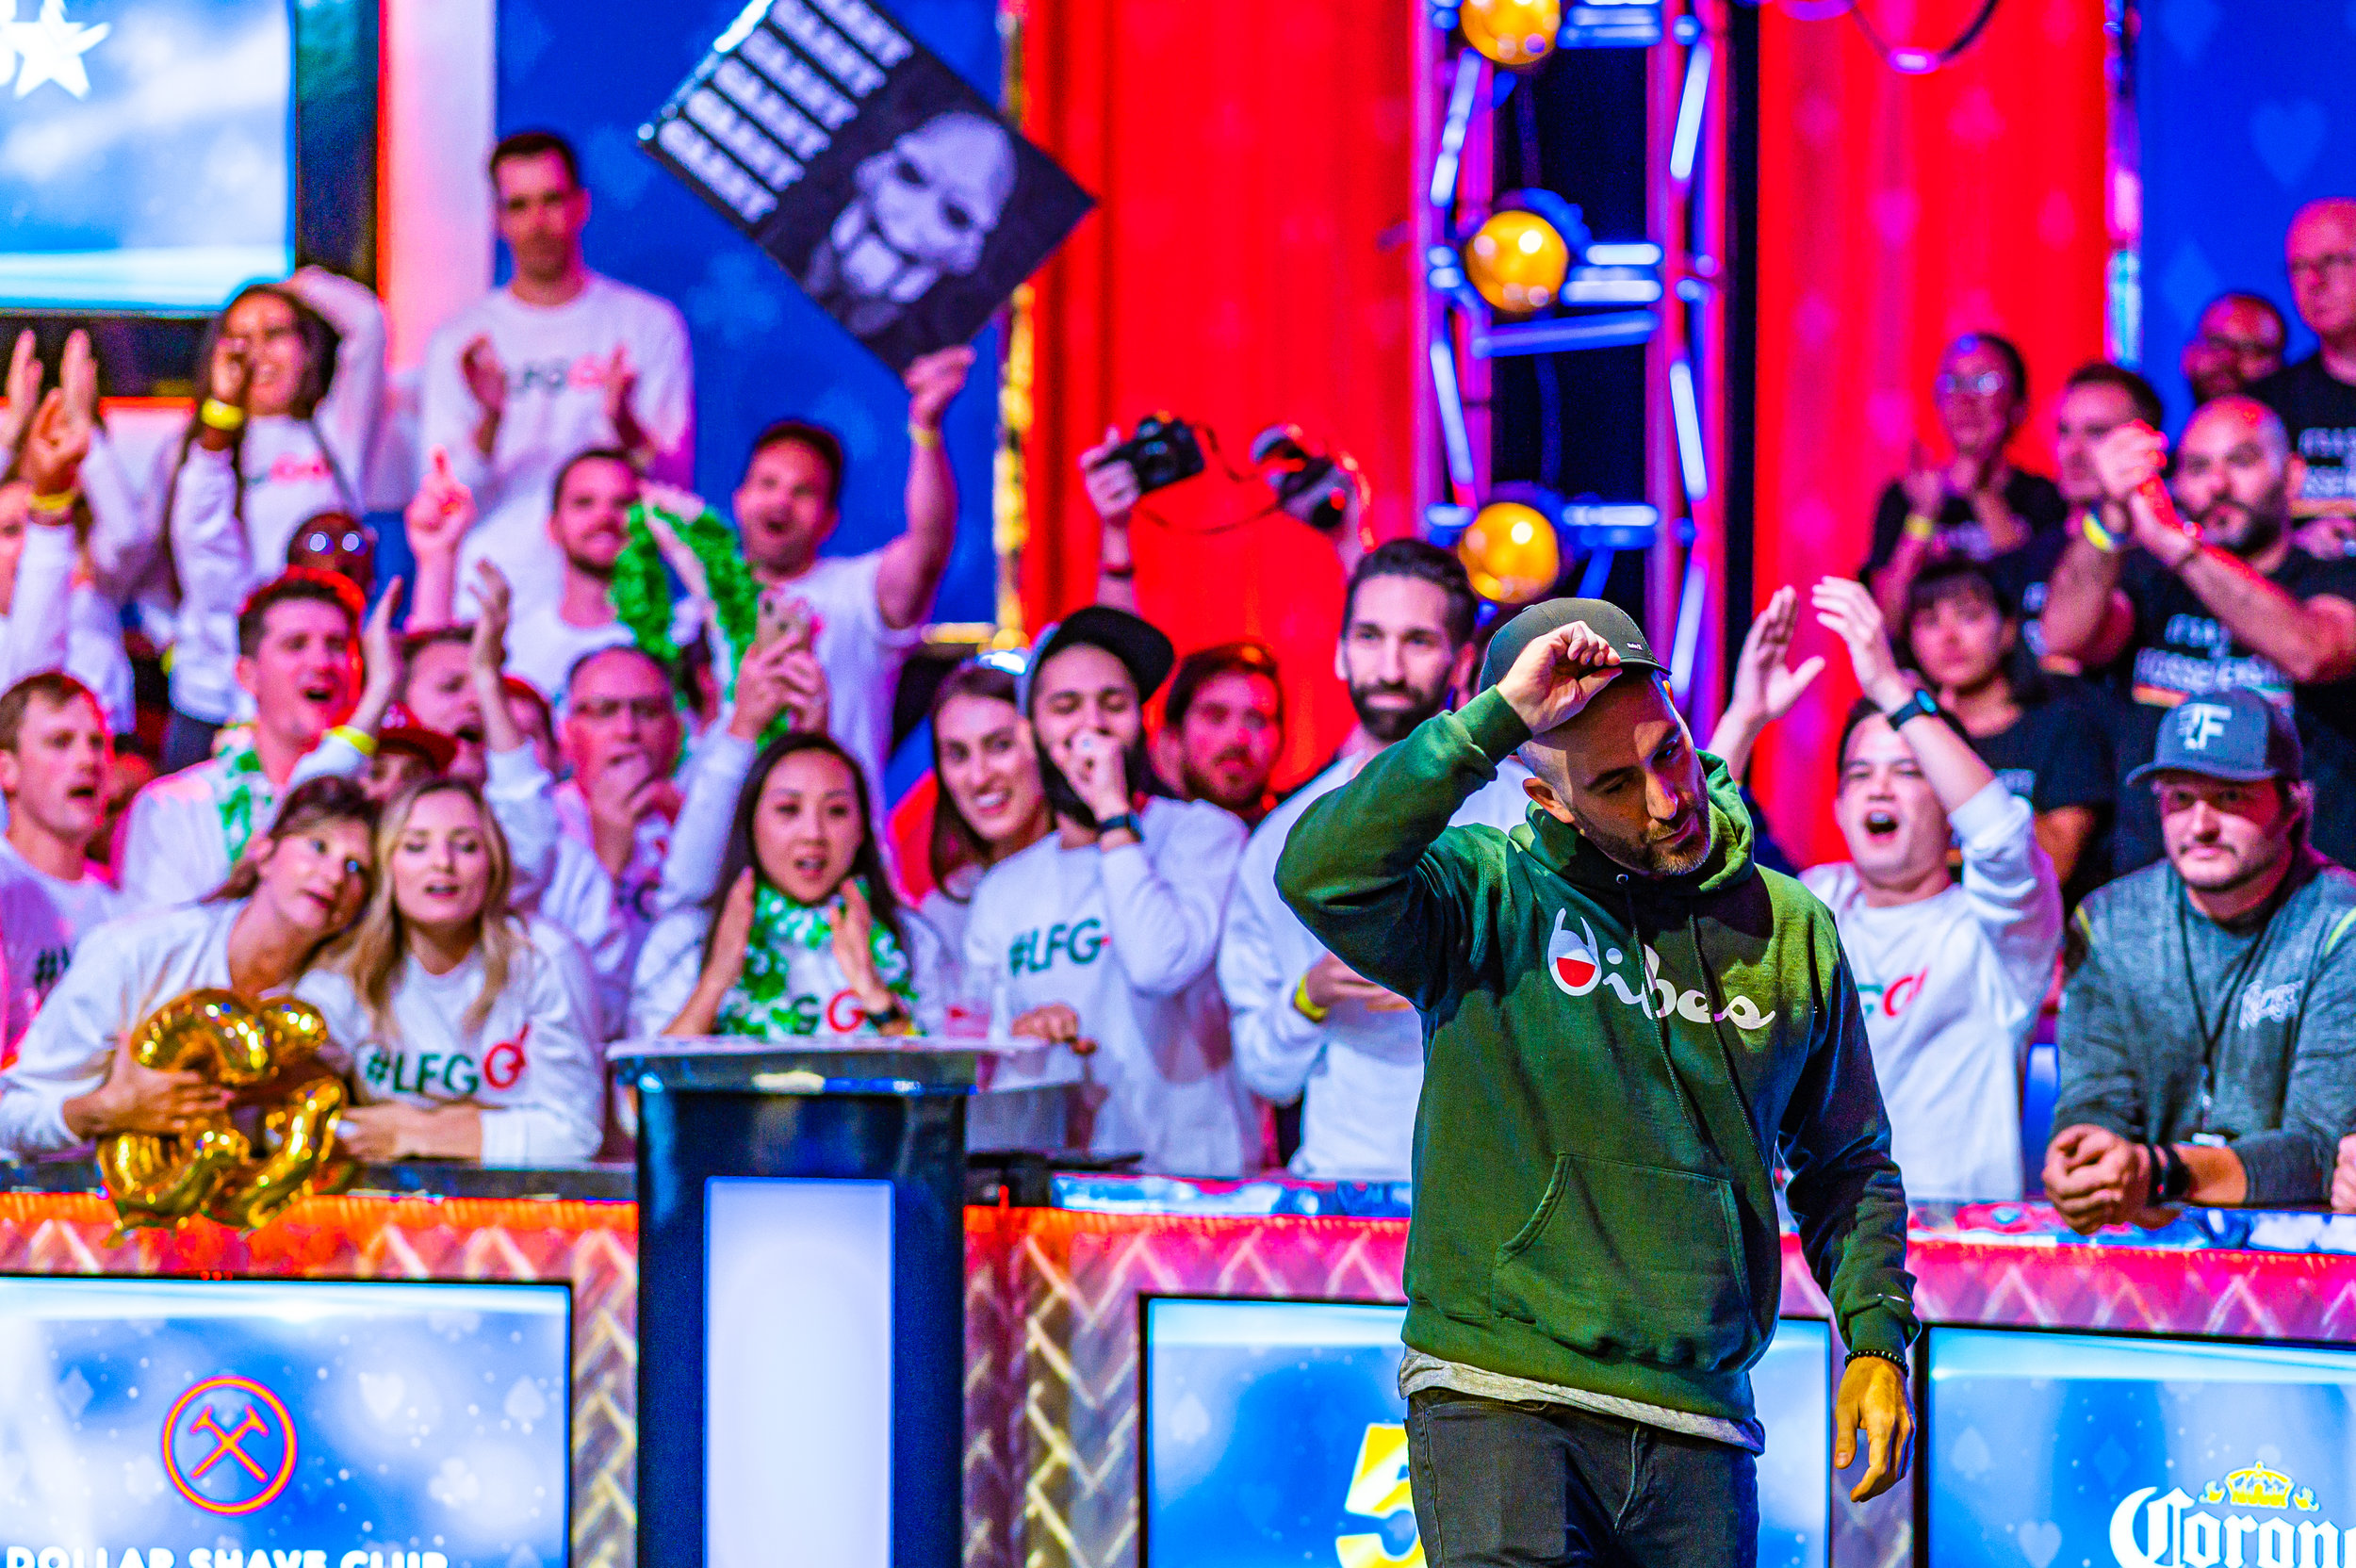 Garry Gates Eliminated_2019 WSOP_ATA_7645.jpg